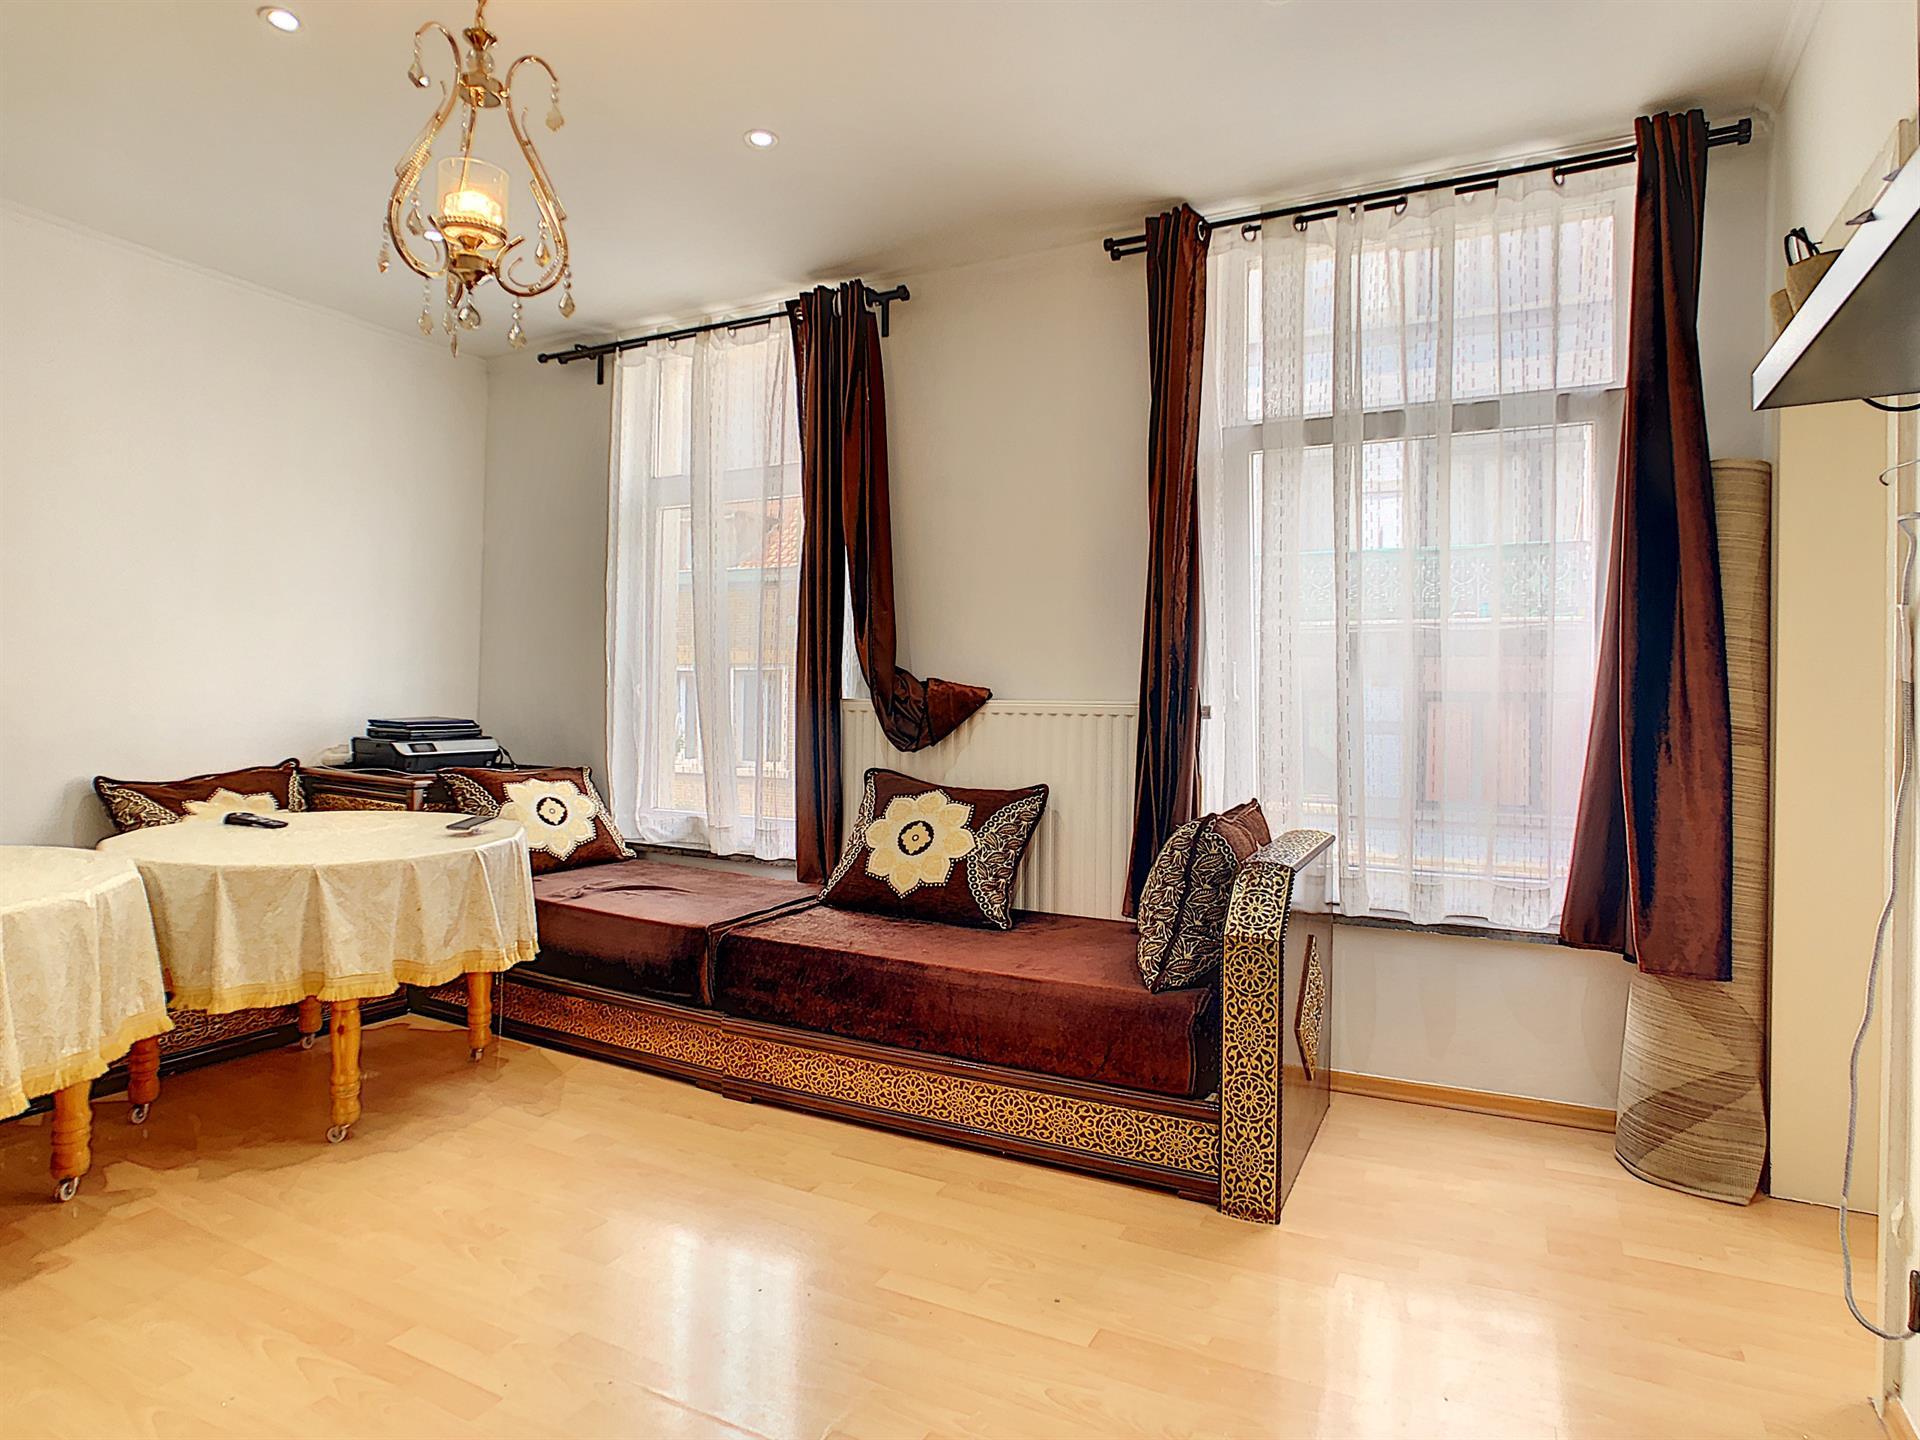 Appartement - Anderlecht - #4383503-1